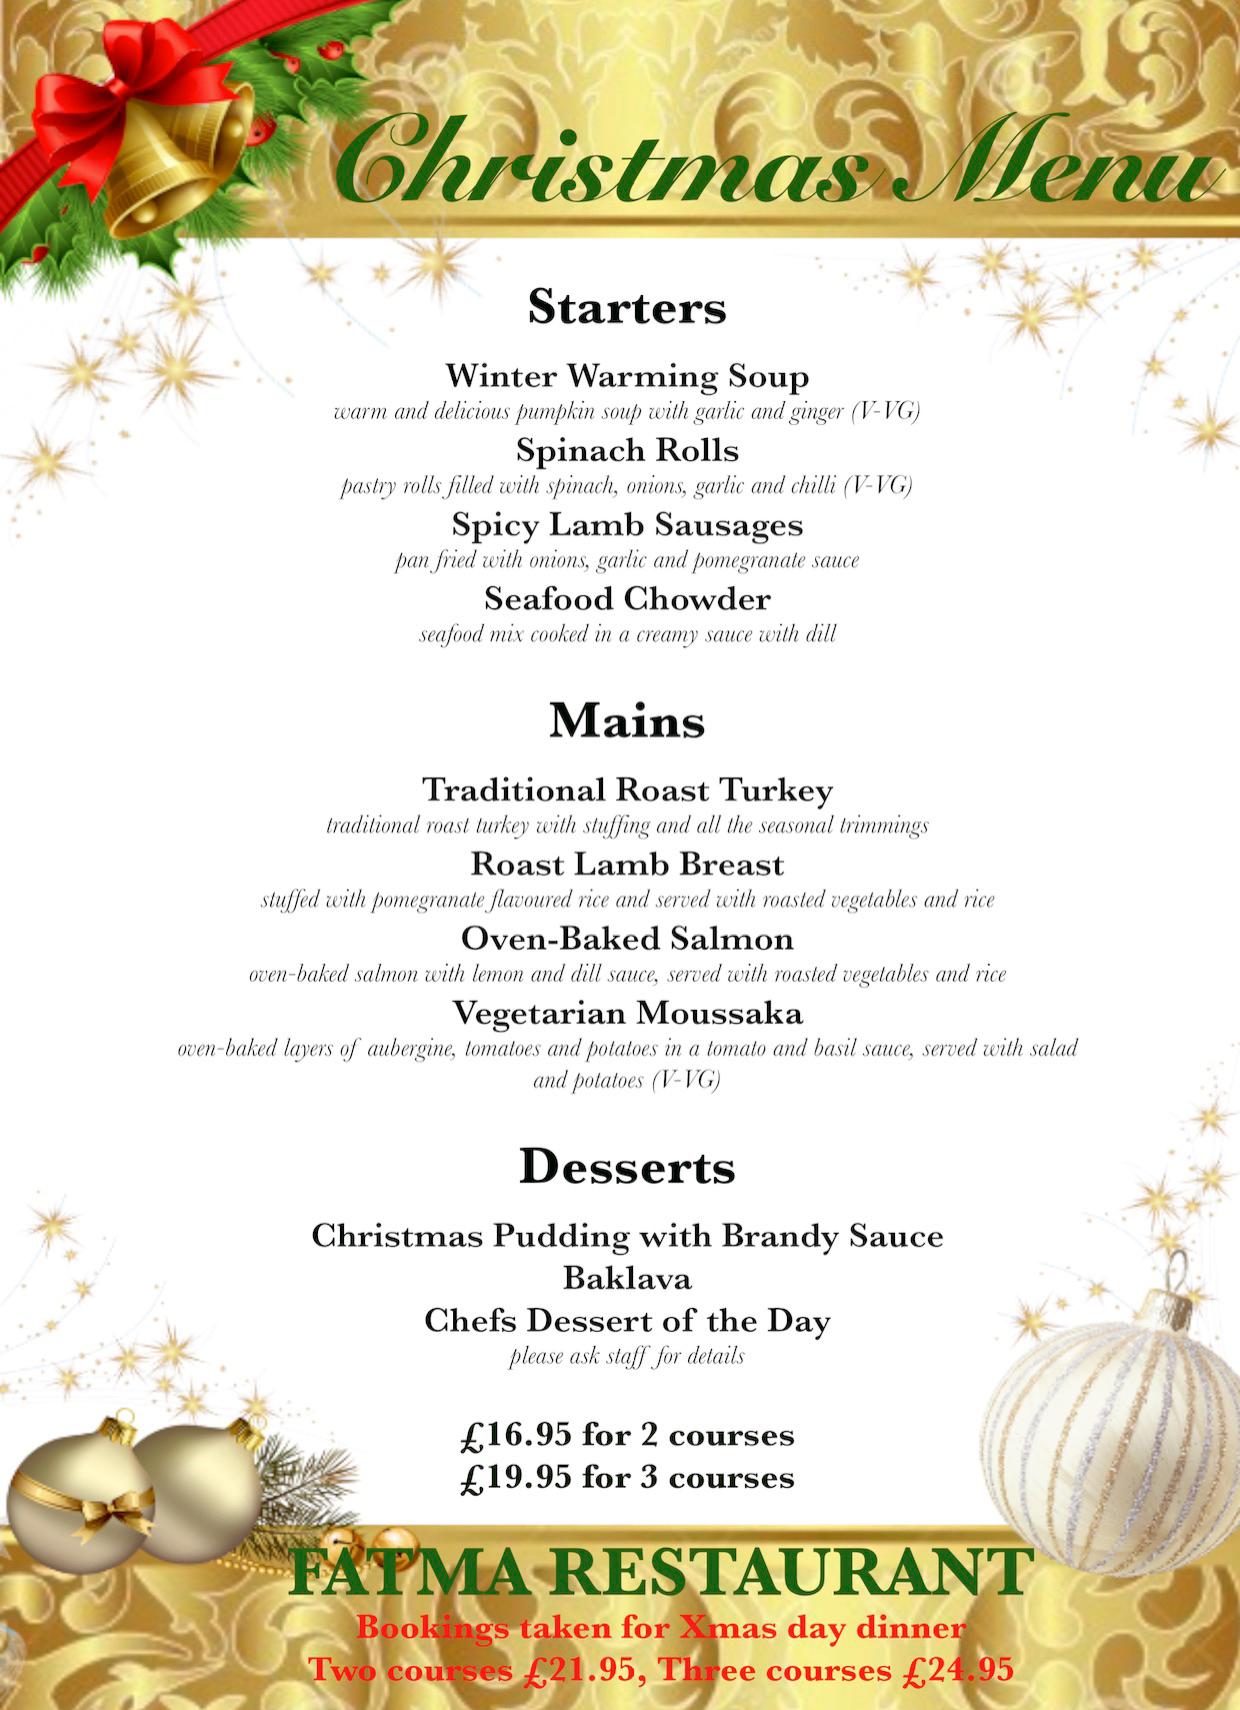 Christmas menu at Fatma restaurant